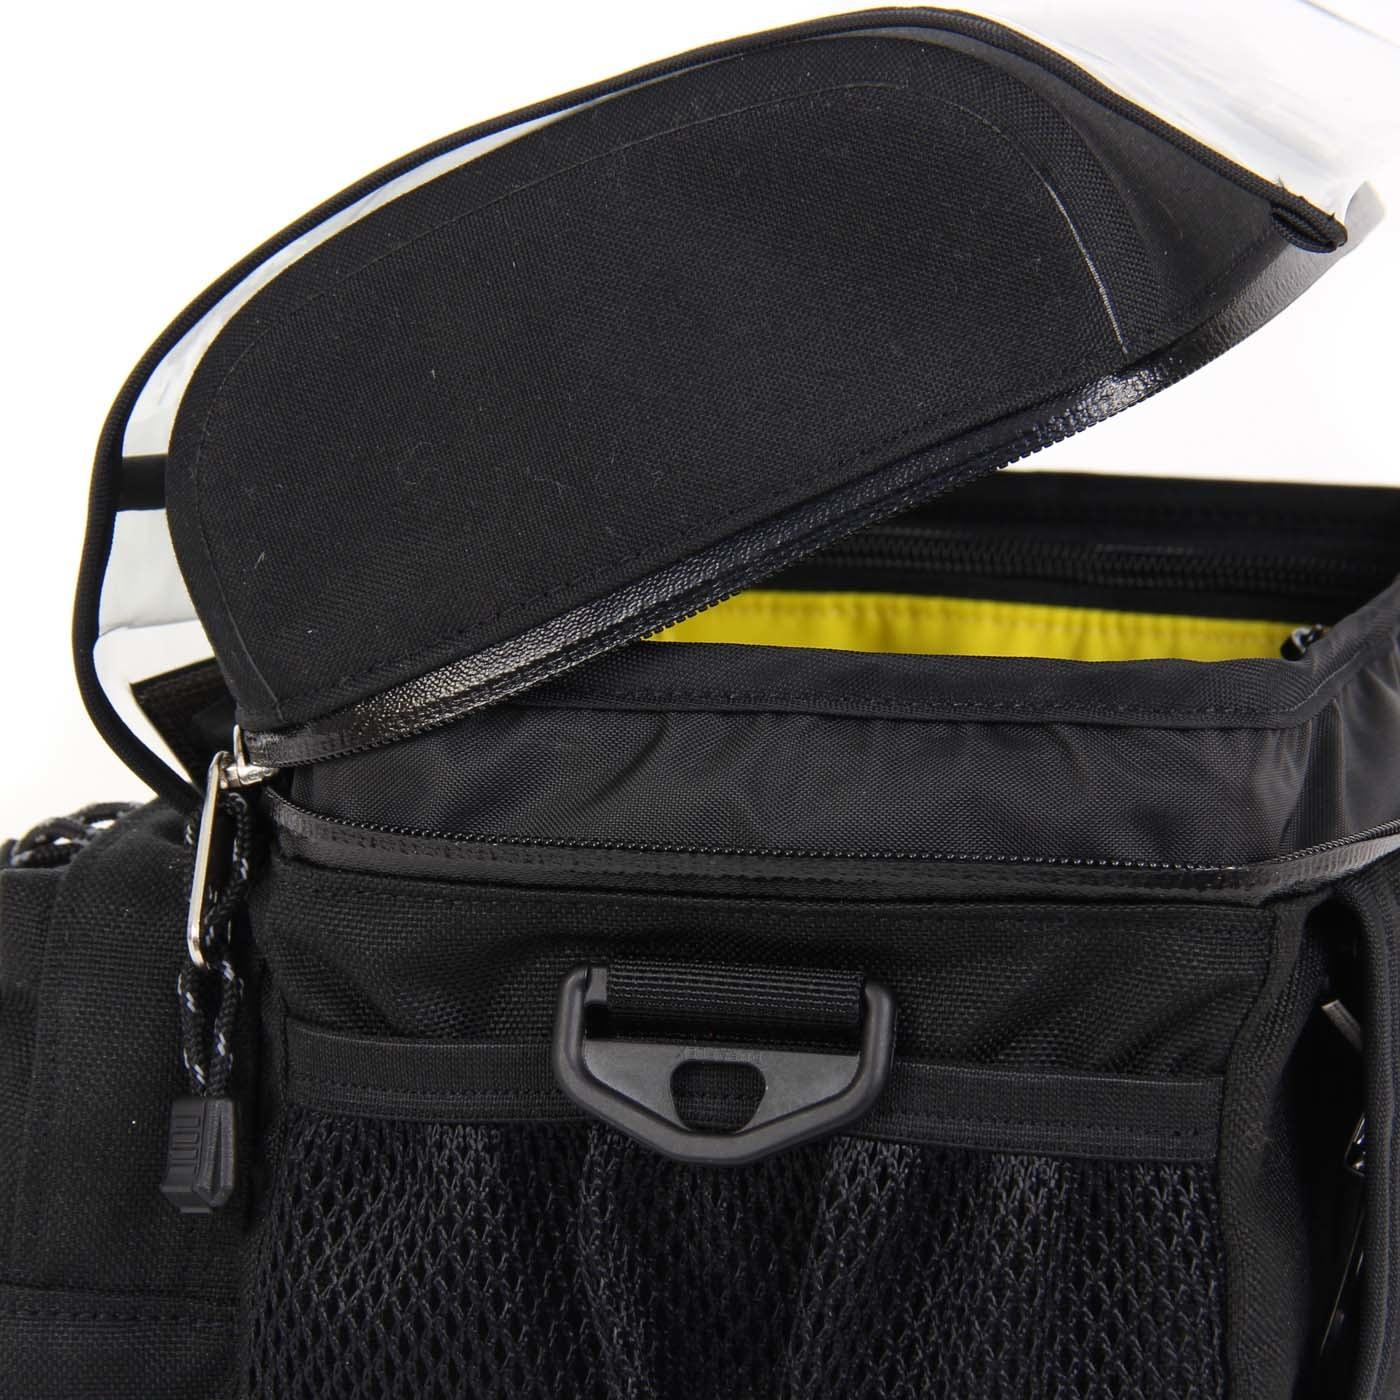 Arkel Arkel Handlebar Bag, Small